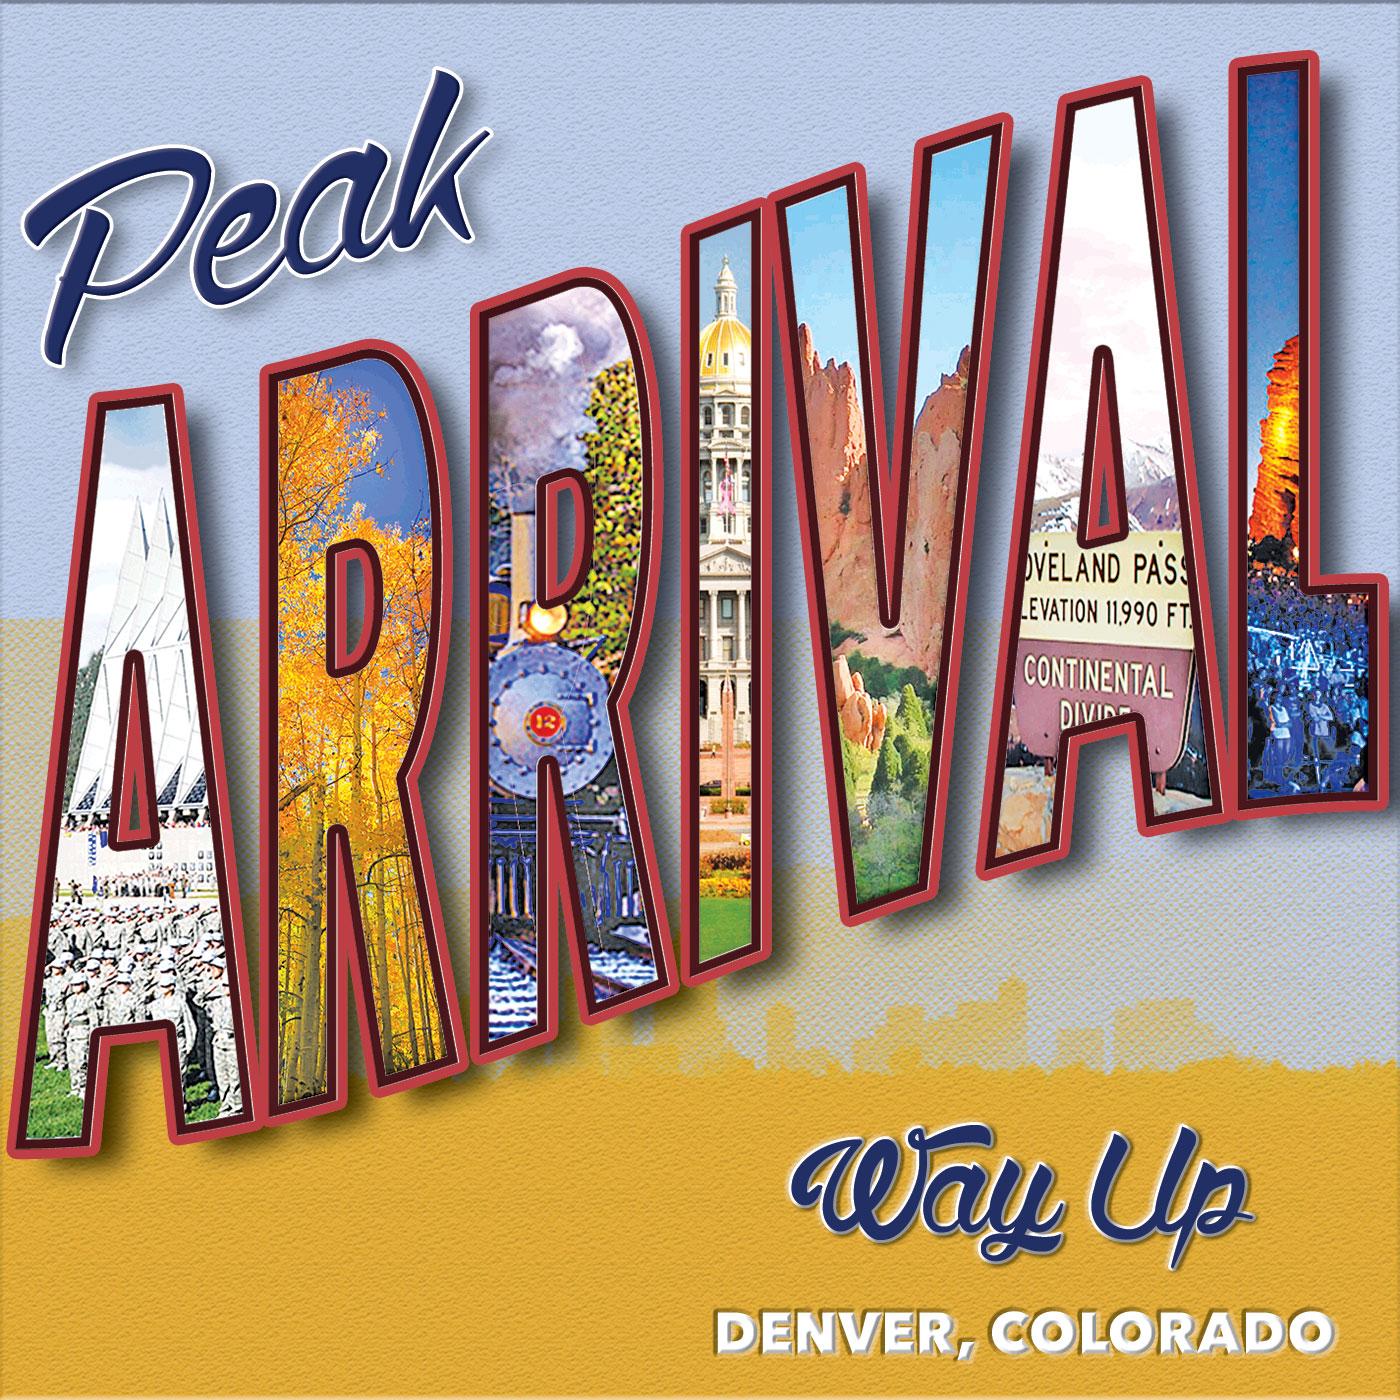 Peak Arrival – Way Up